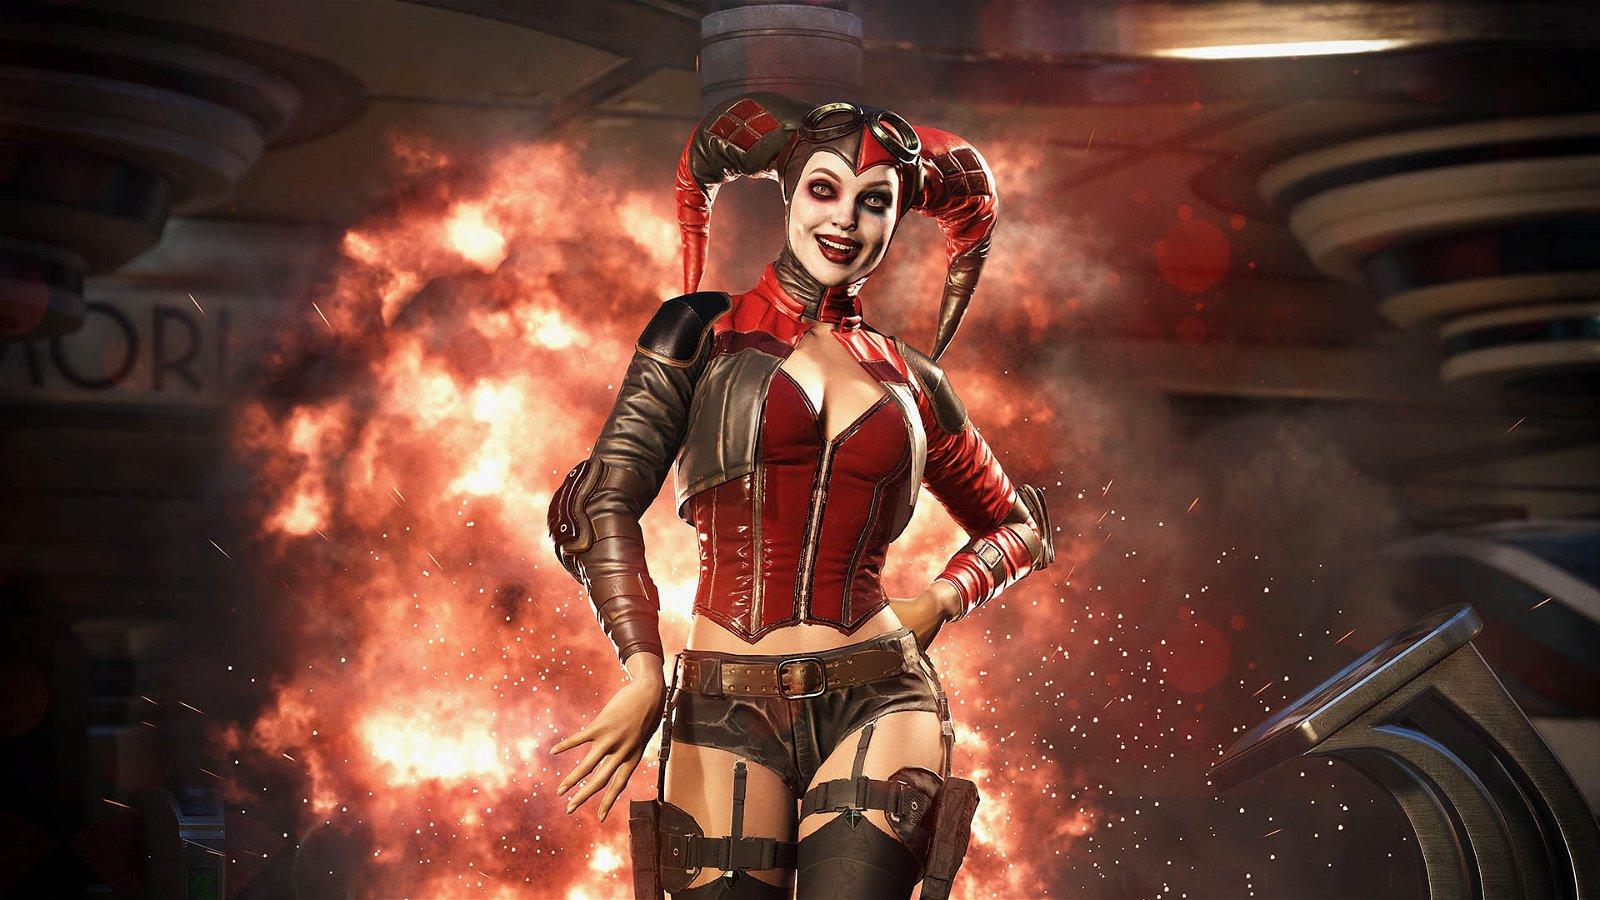 Injustice 2 Gameplay Videos Leak 2